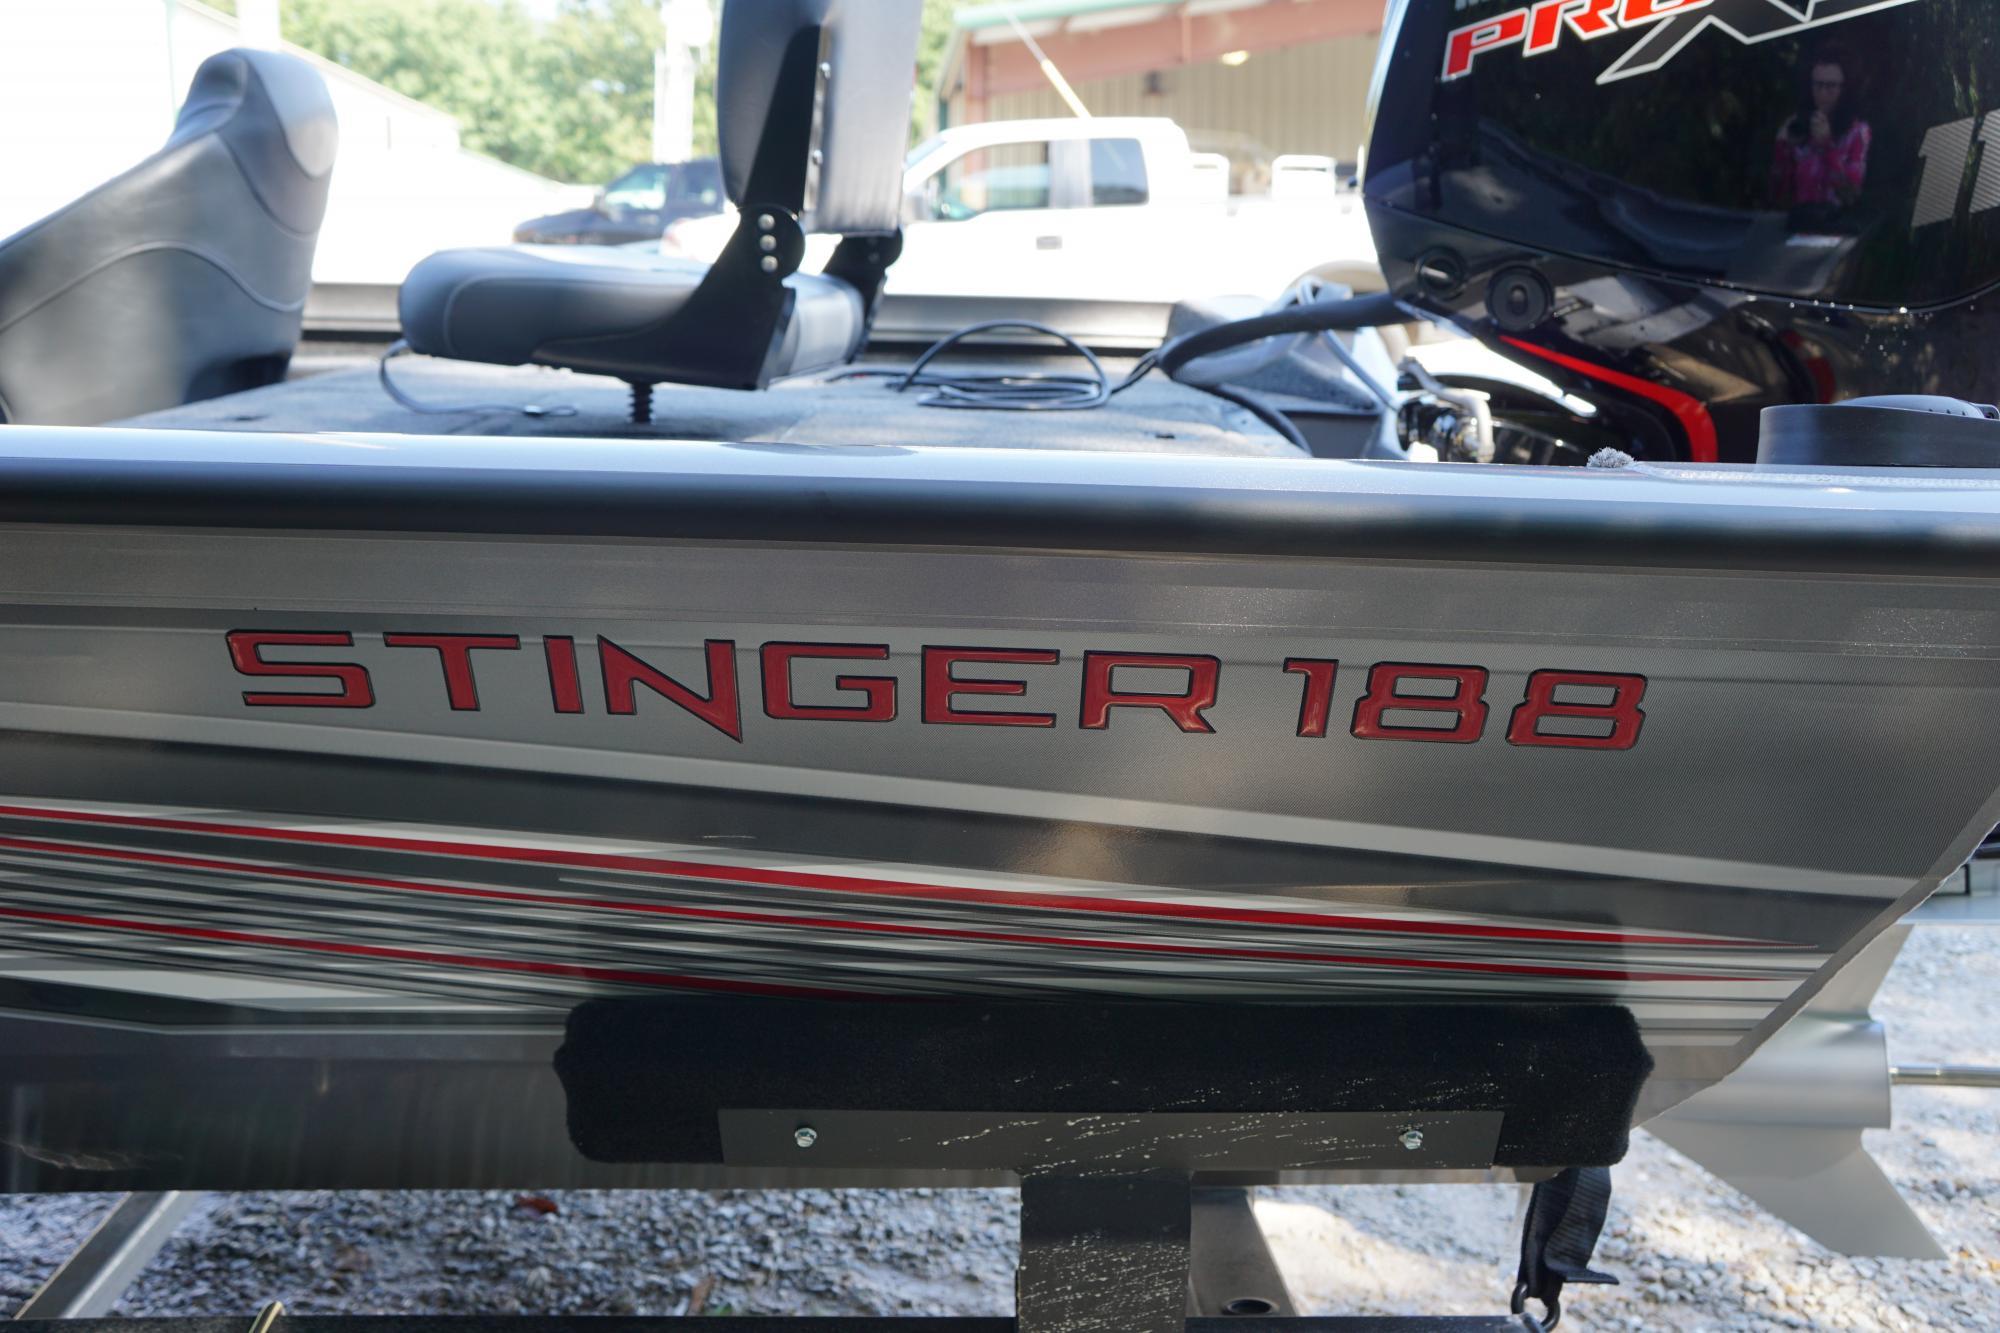 2019 LOWE STINGER 188 W/ 115HP MERCURY